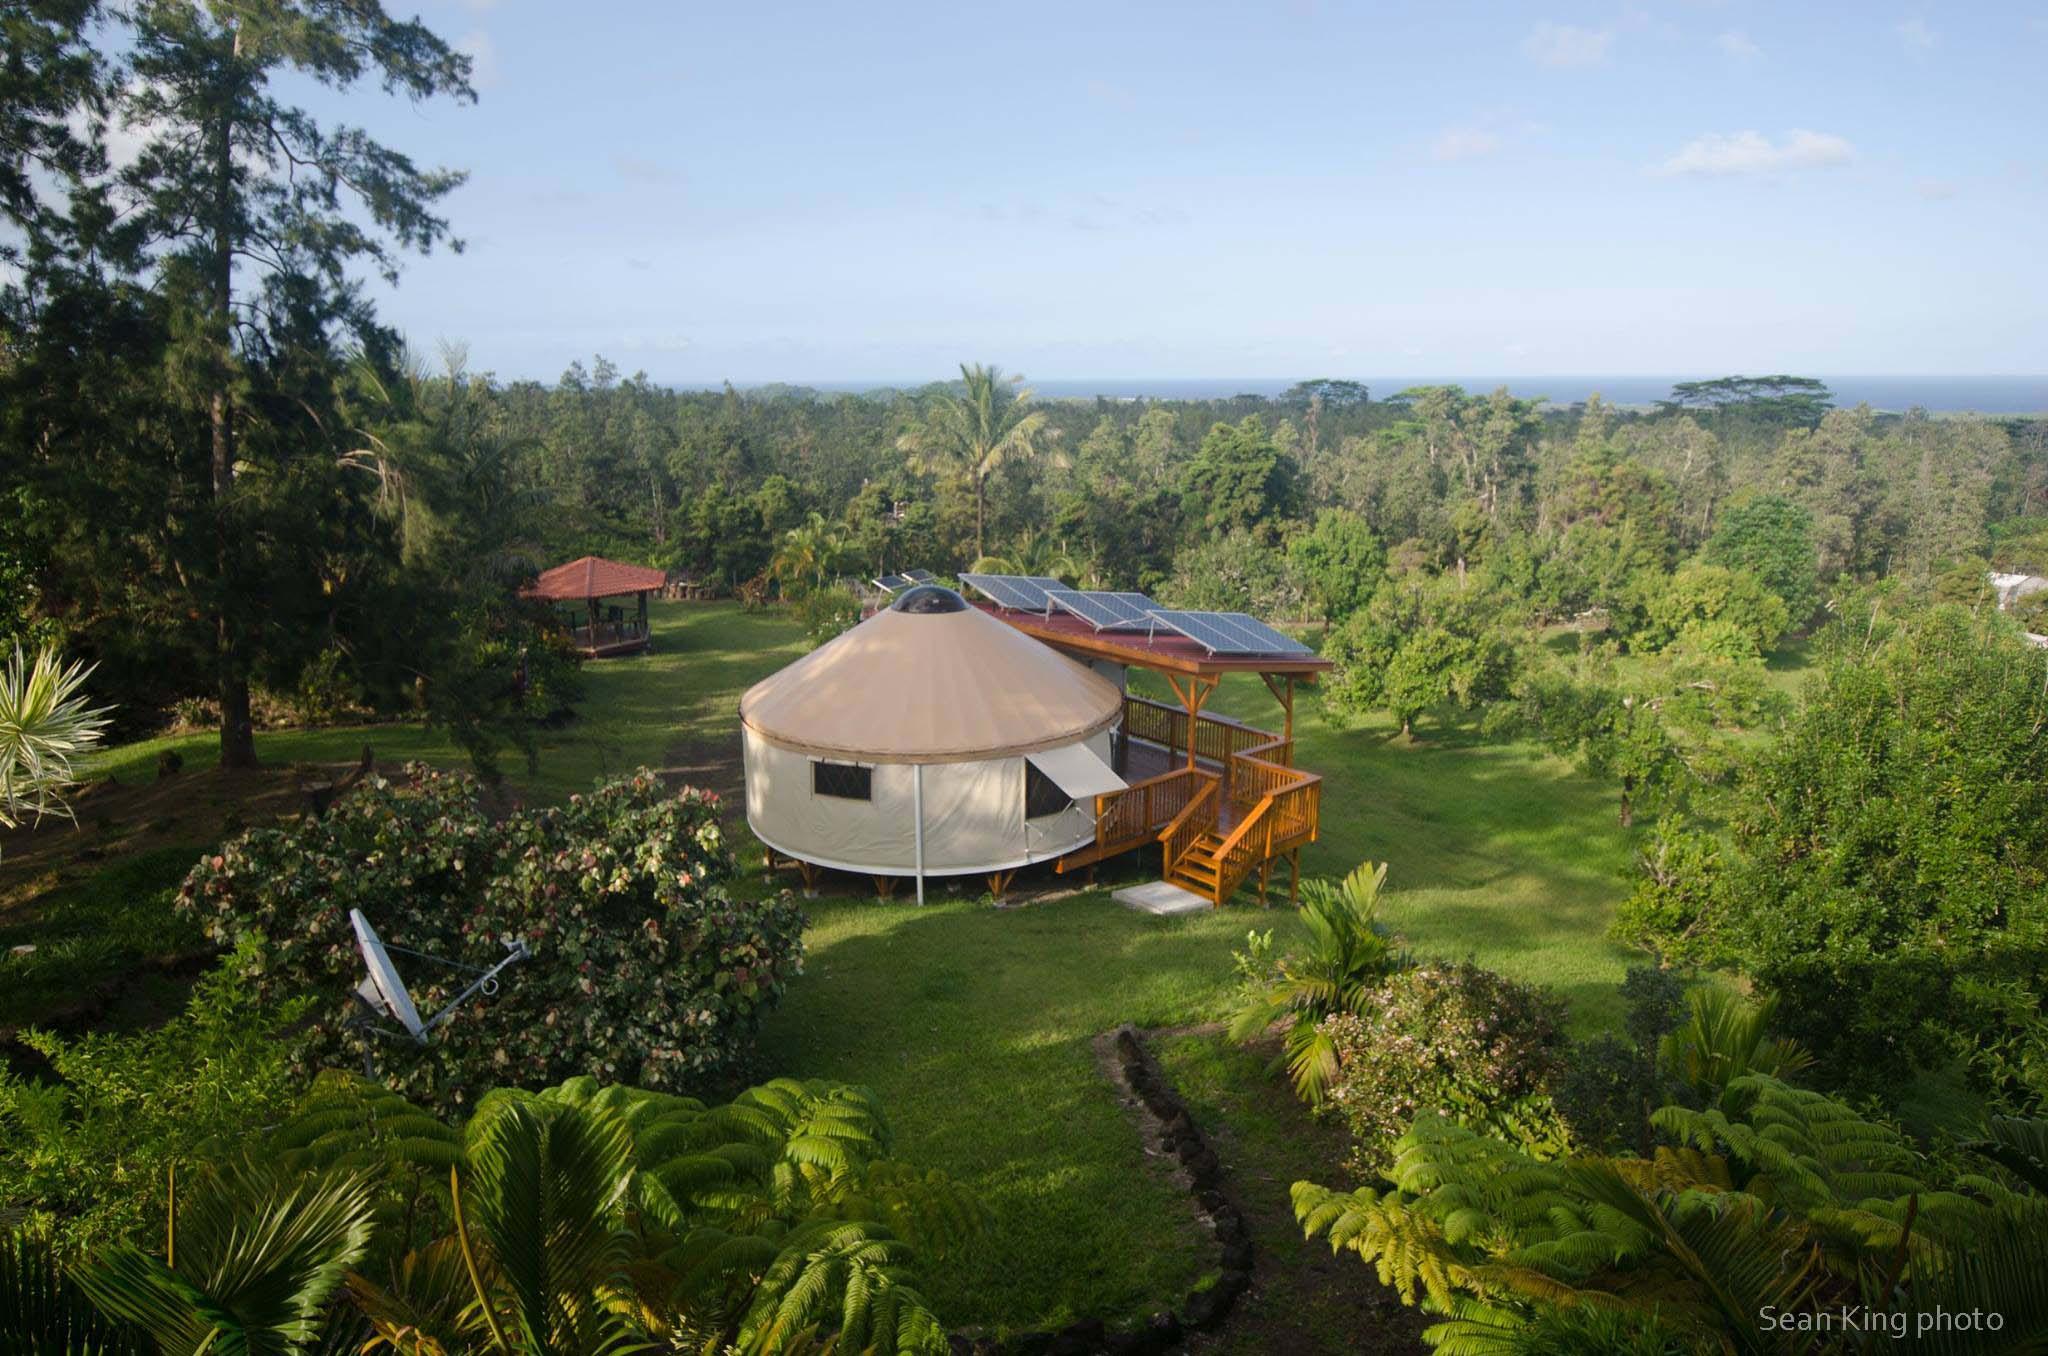 Click image for larger version  Name:Hawaiiyurt-Sean-King[1].jpg Views:372 Size:318.2 KB ID:999